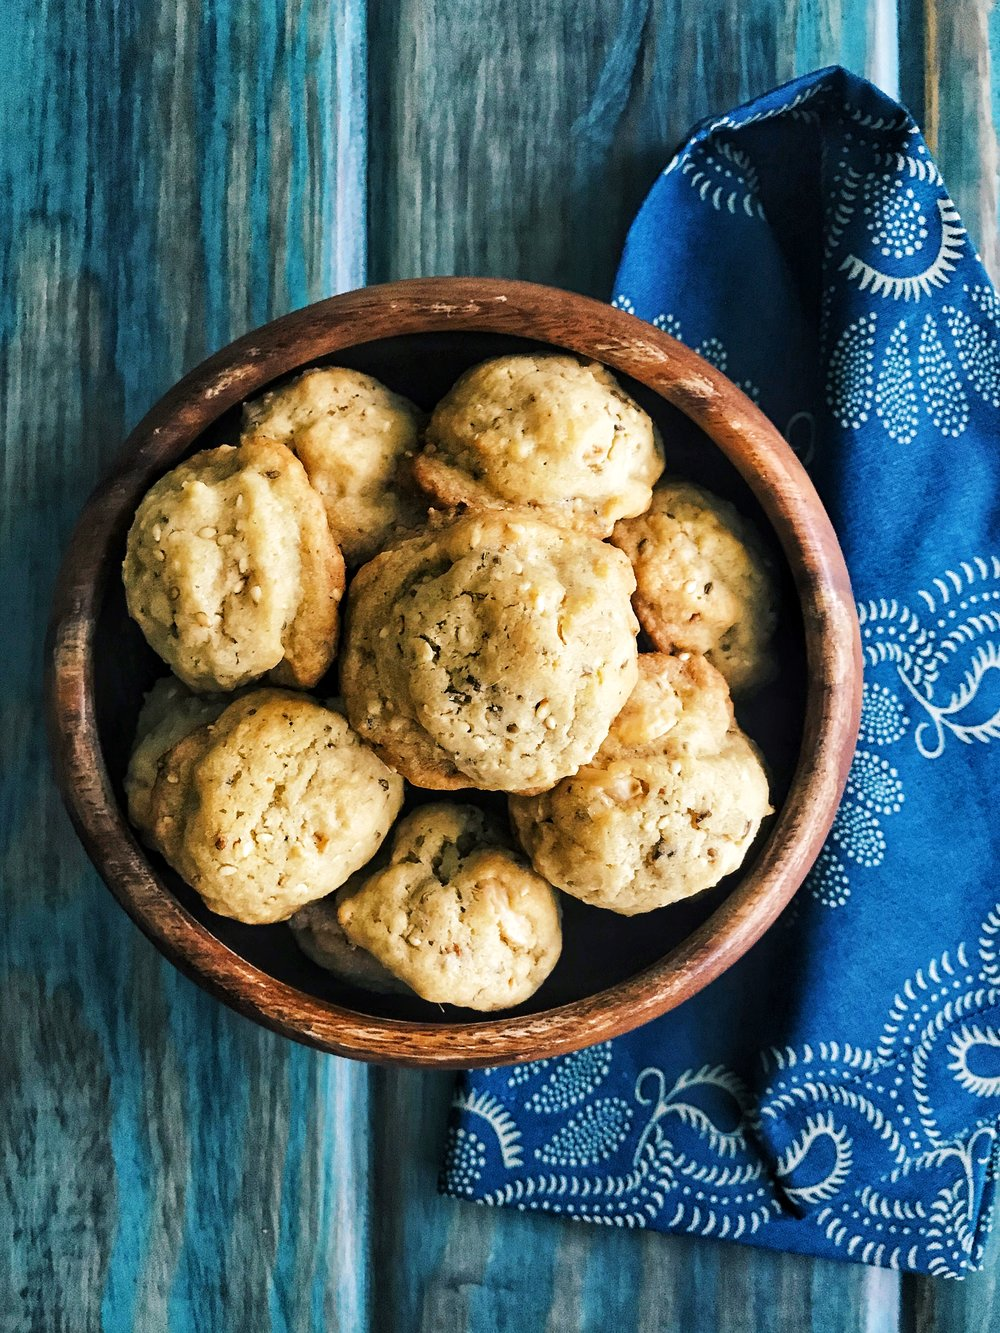 Almond & Anis Cookies | RafaellaSargi.com